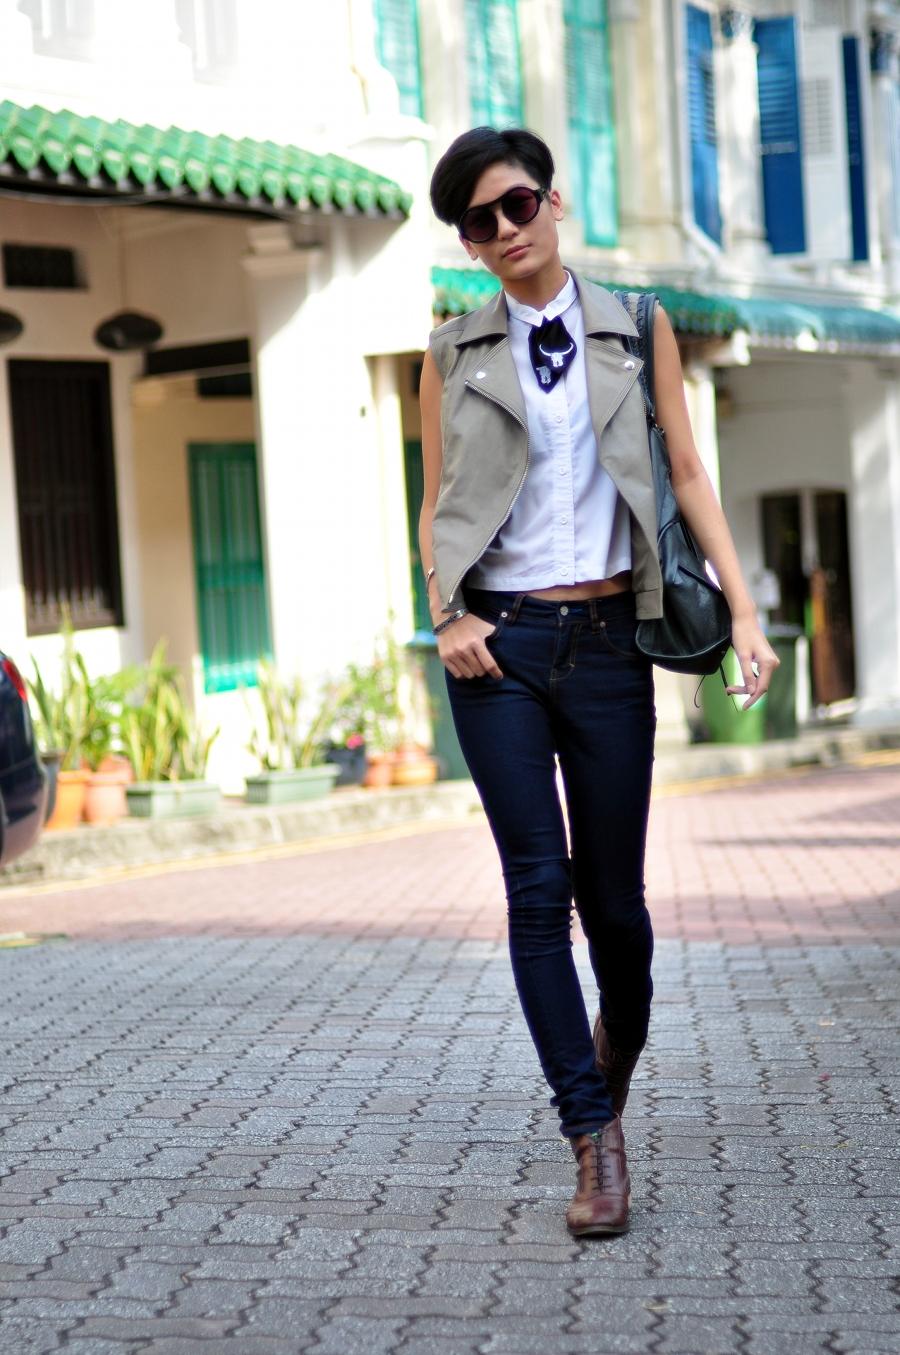 a097d0d6140 Fashion Street: Girls dressed like a Man